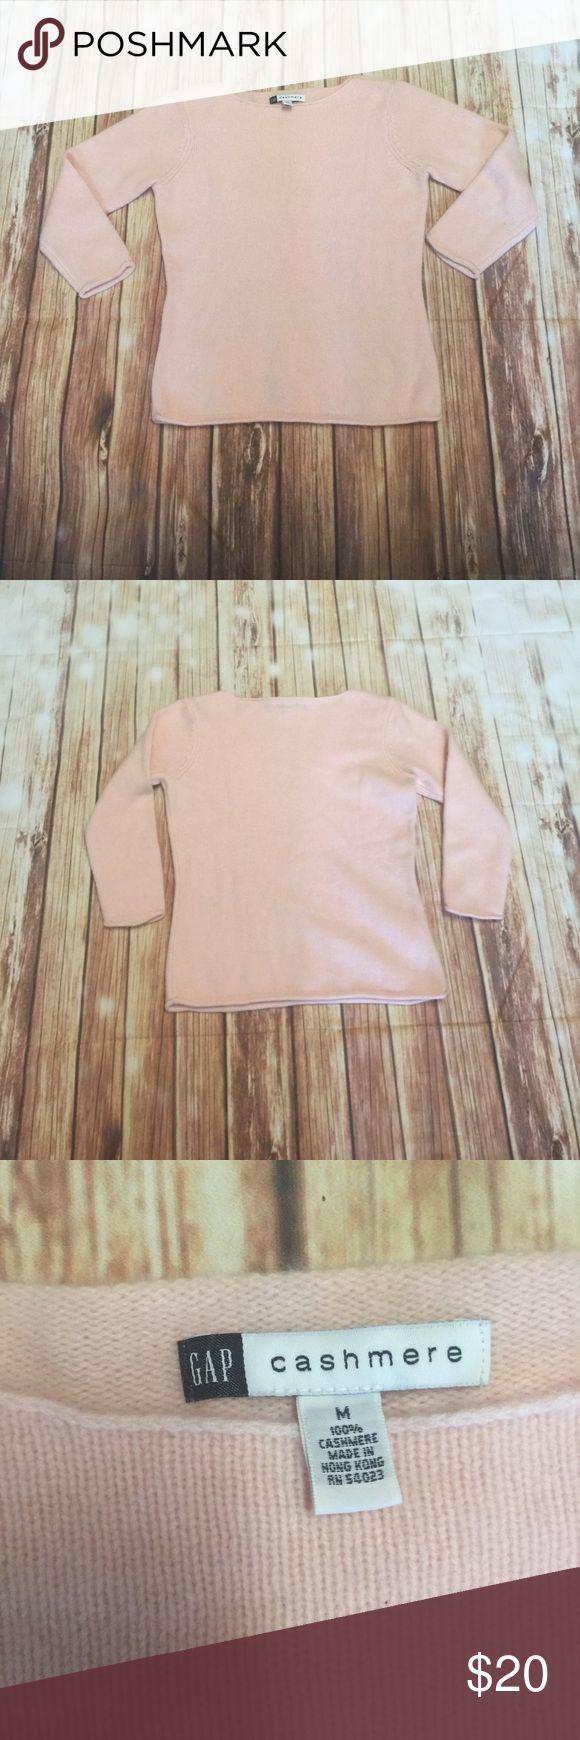 "Gap women's 100% cashmere sweater pink size m Length 22"" armpit to armpit 18"" GAP Sweaters Crew & Scoop Necks"